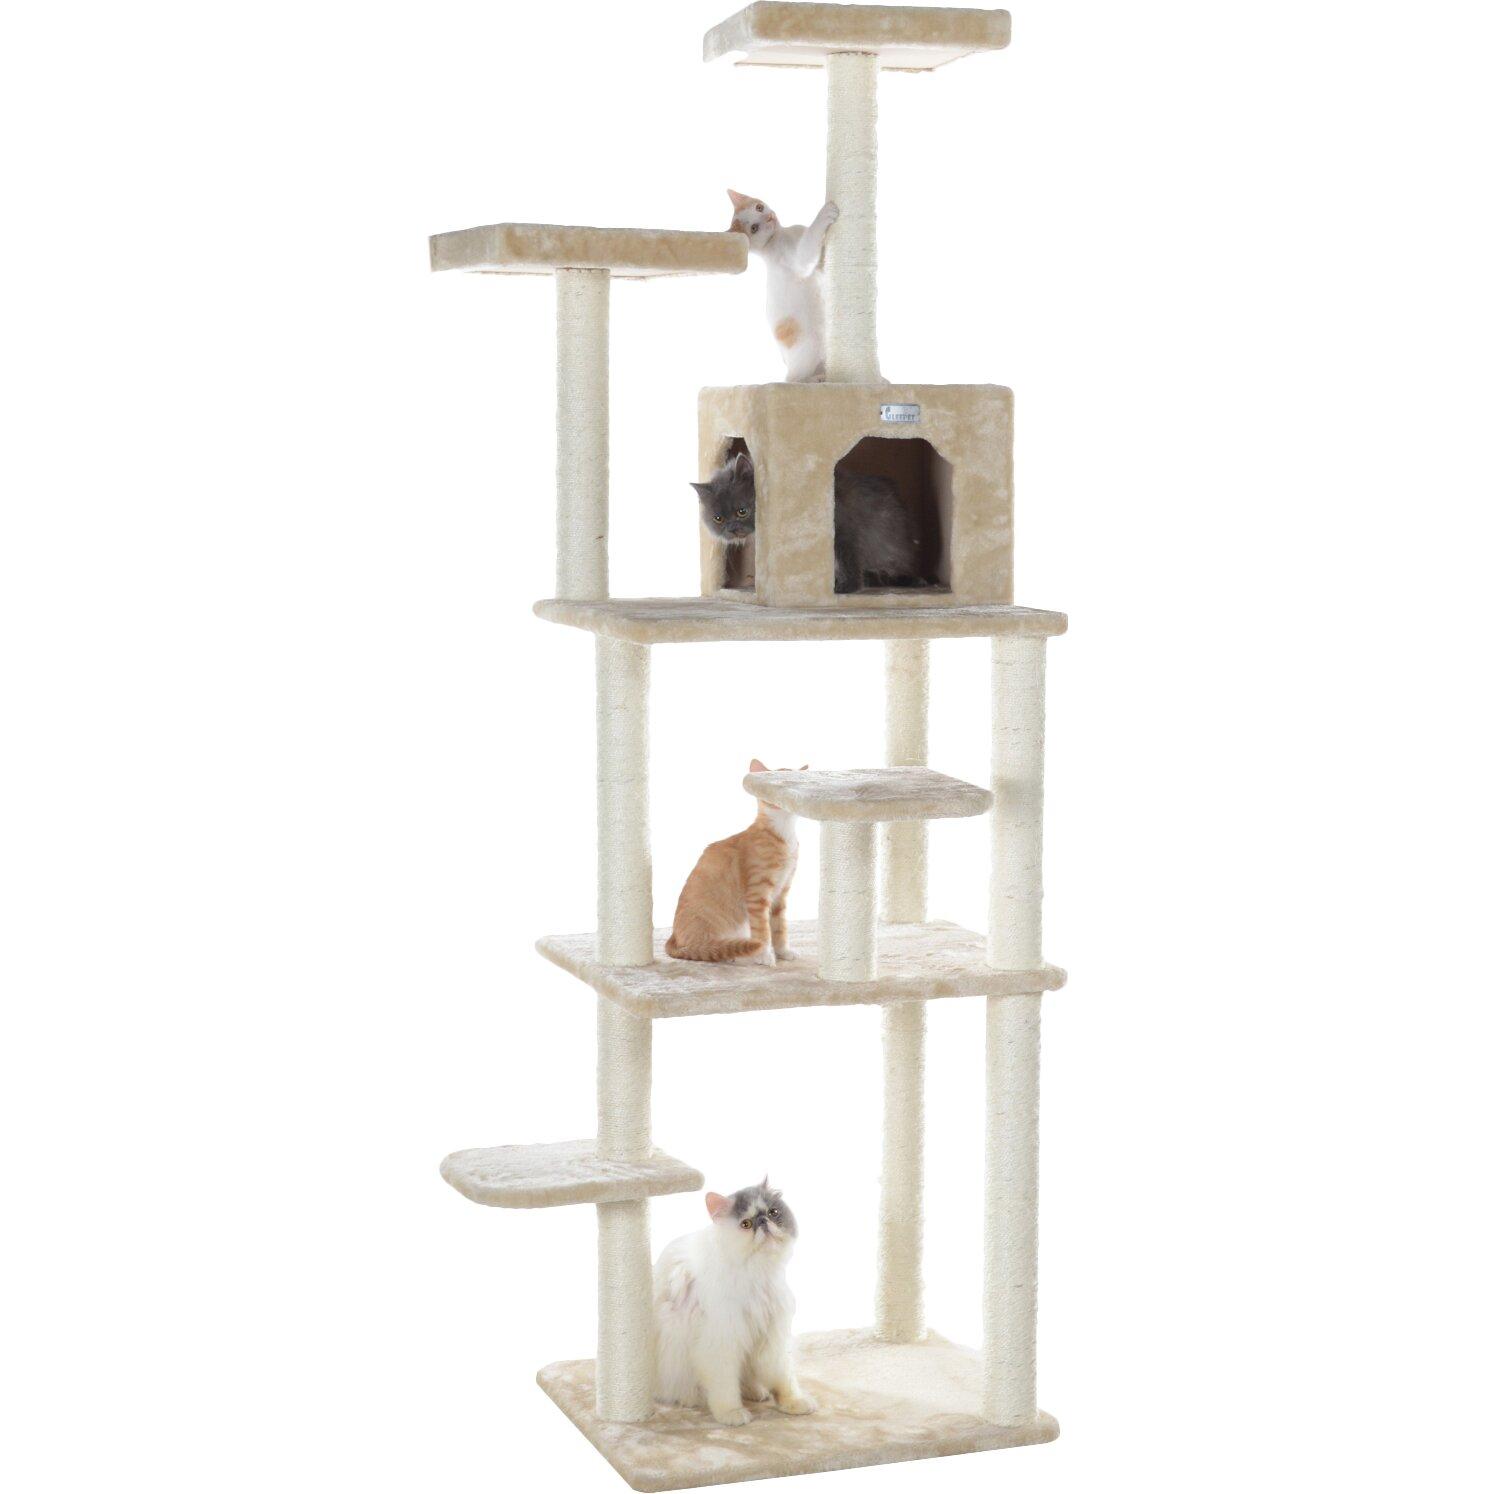 cat hanging head down